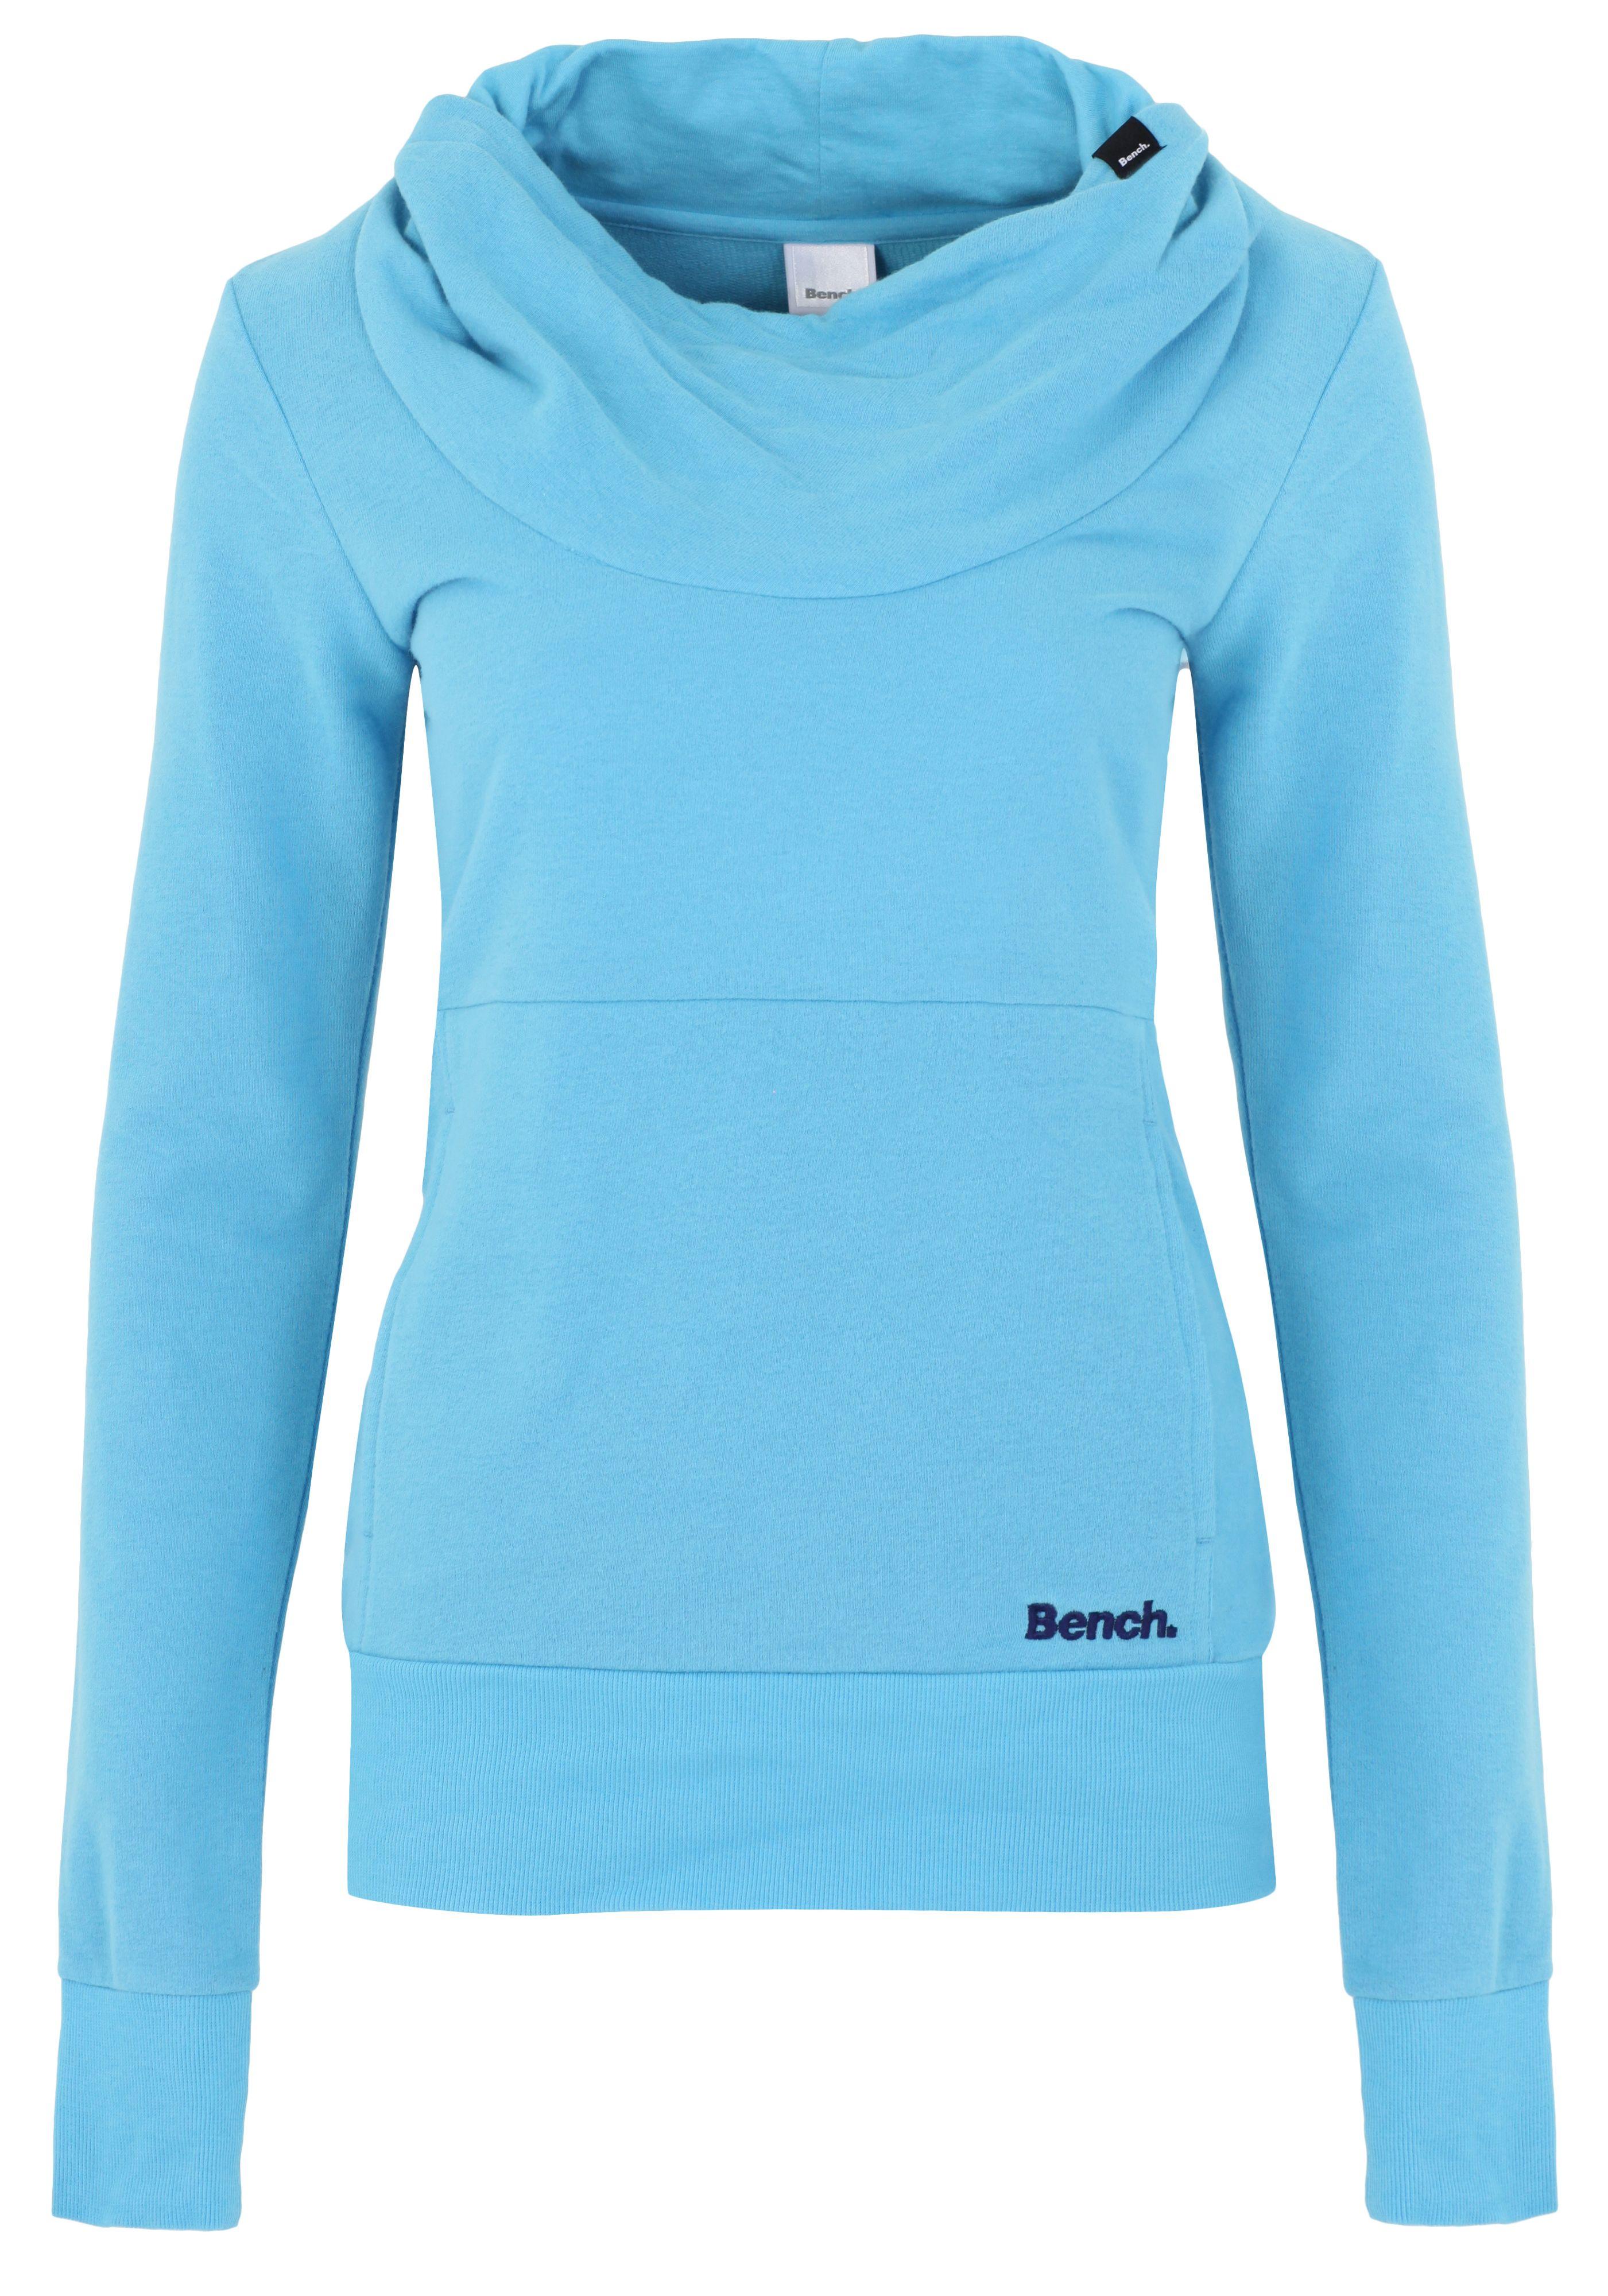 Bench Inclu Cowl Neck Sweatshirt In Blue Lyst